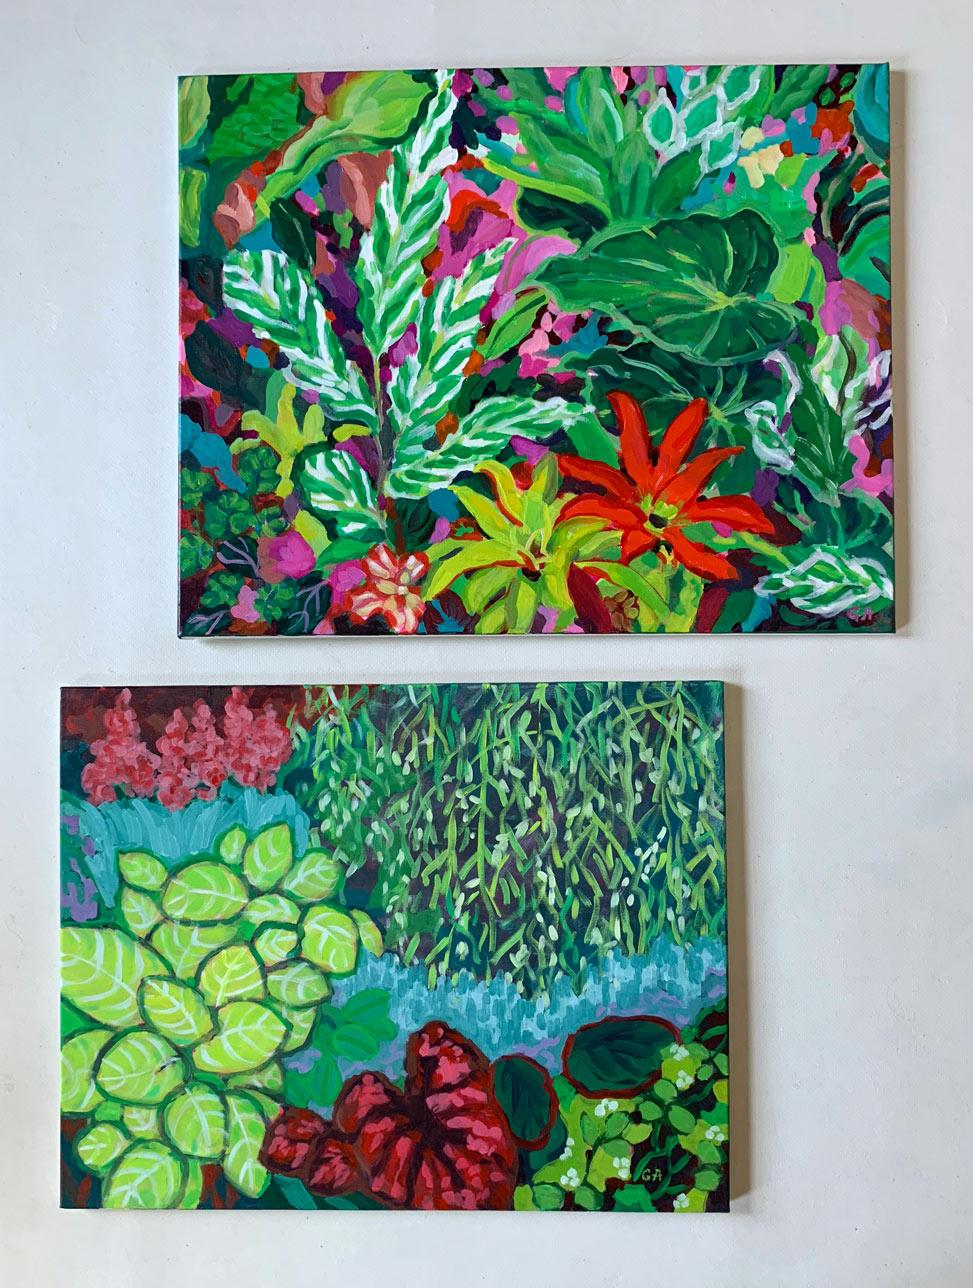 July-Bromeliad-Garde-Giselle-Ayupova-acrylic-paintings.jpg